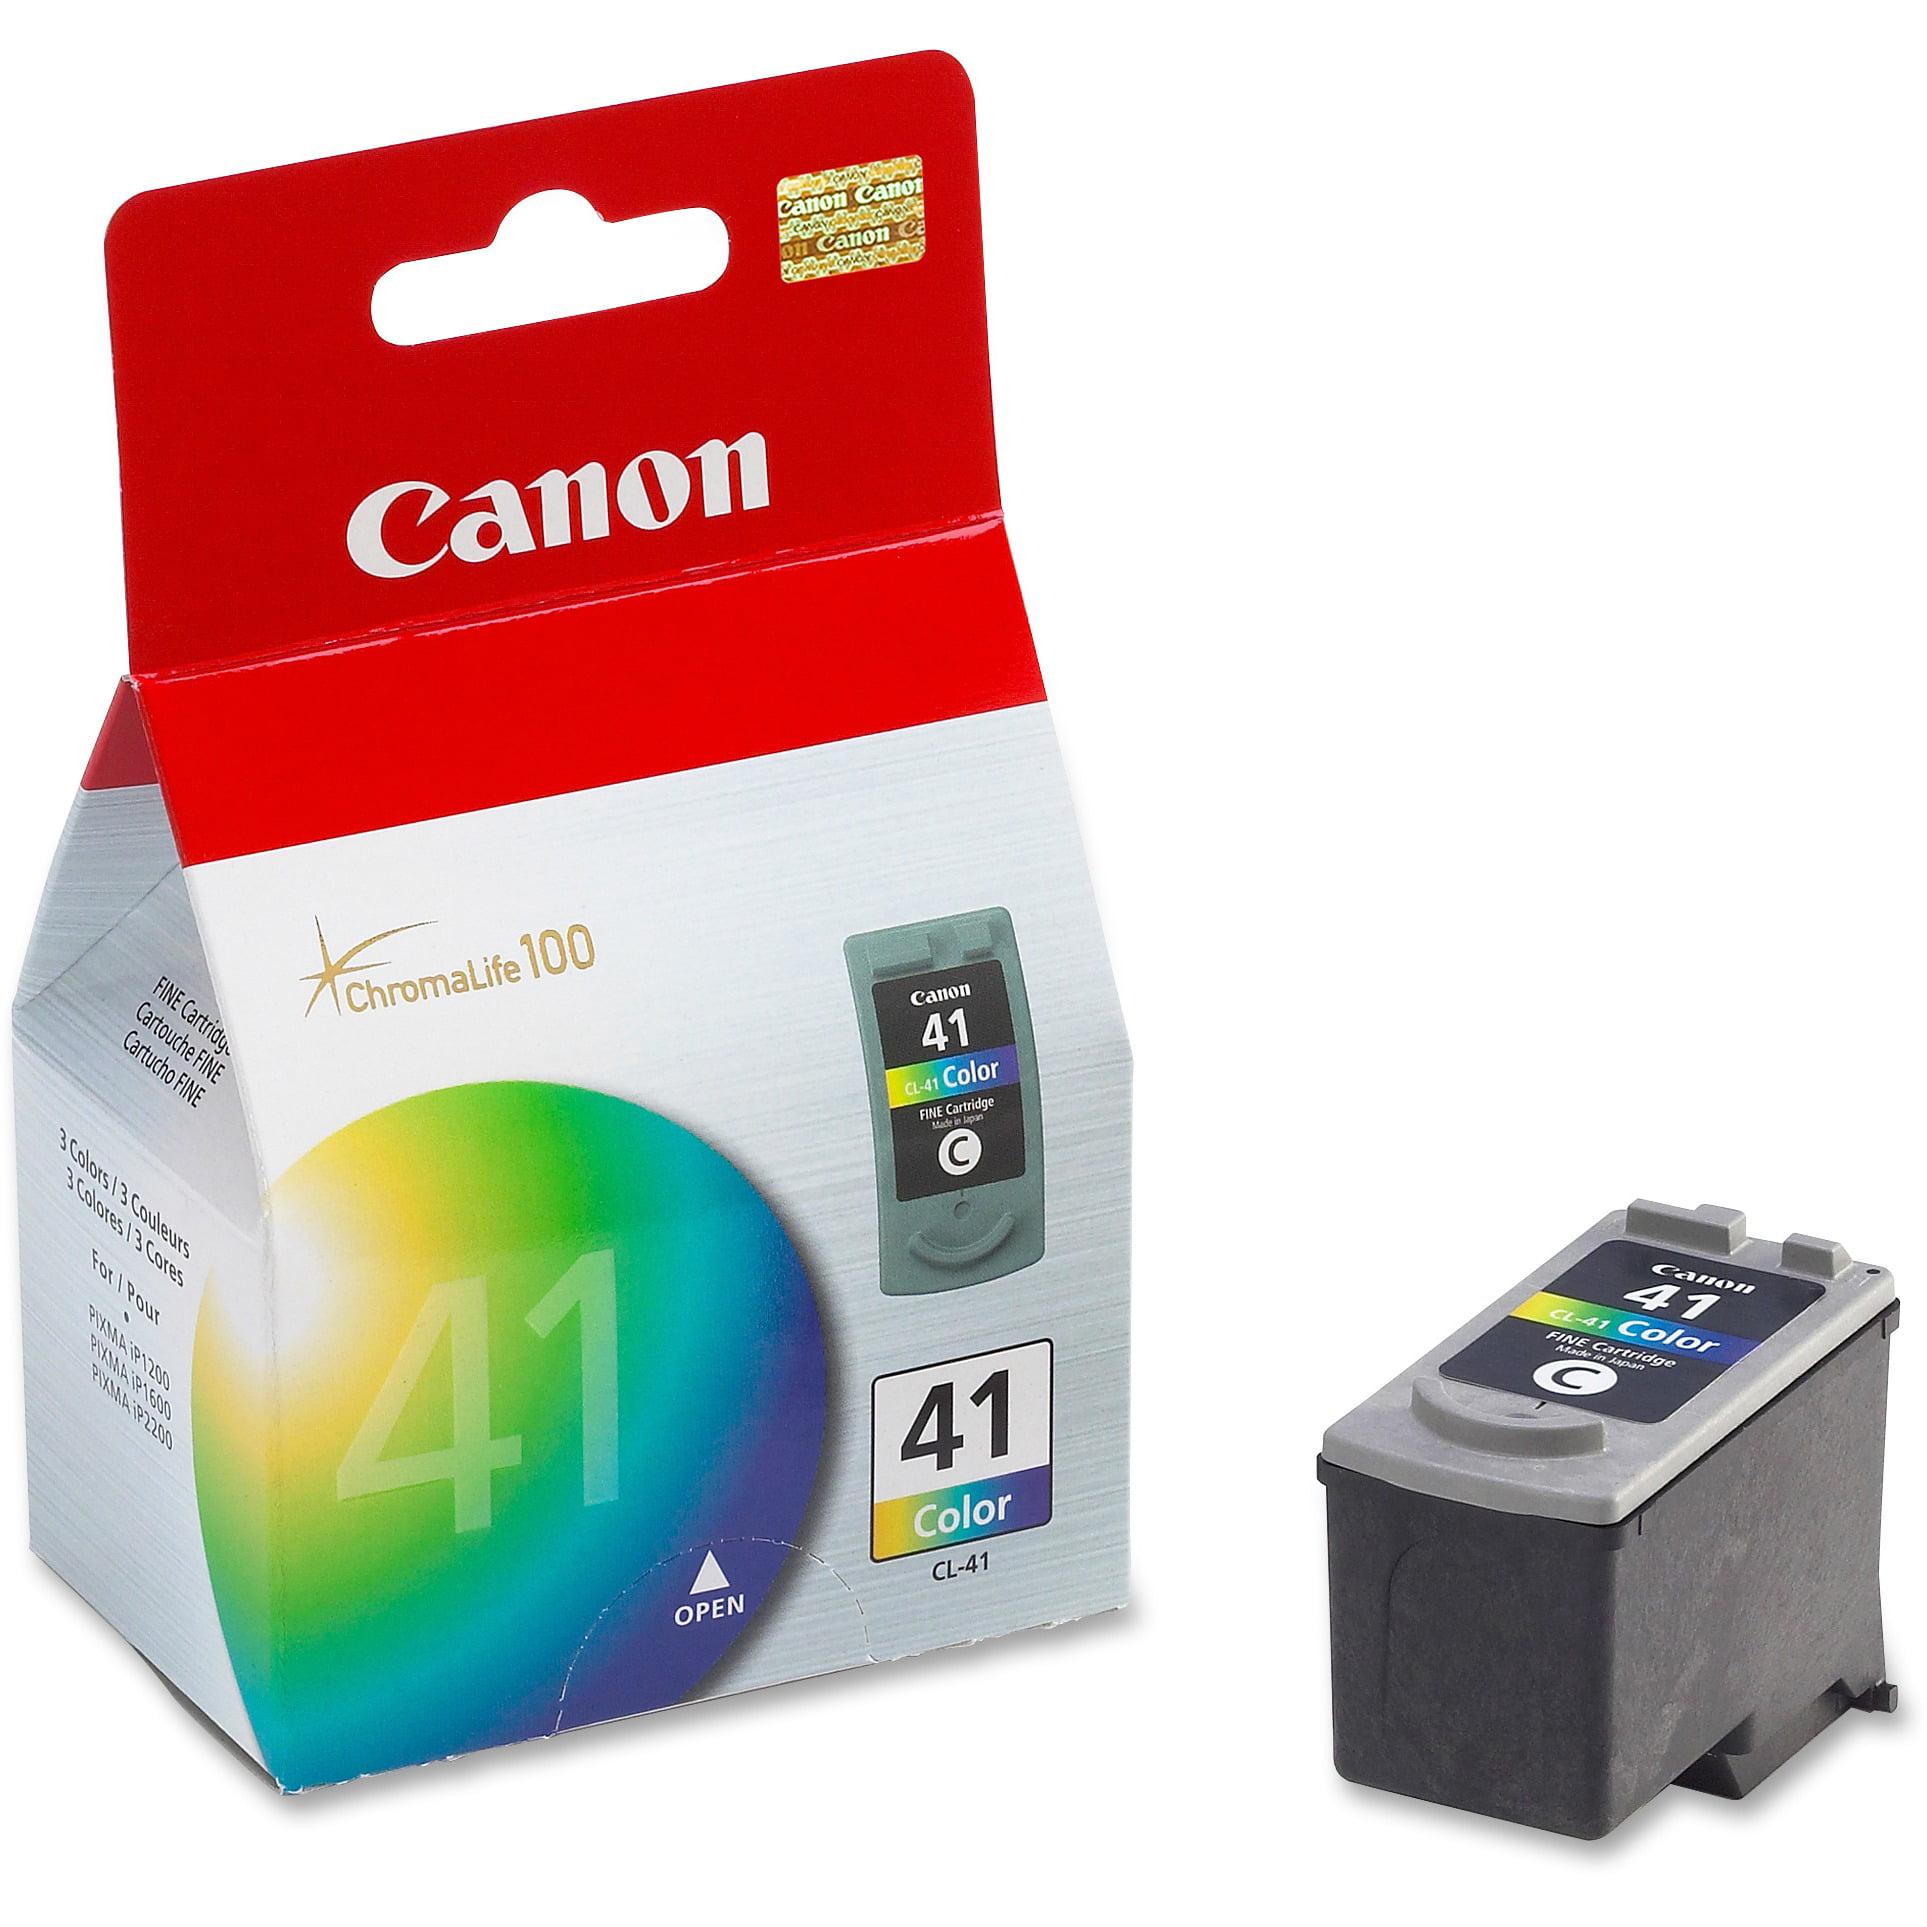 Canon CL-41 Original Ink Cartridge, 1 Each (Quantity)